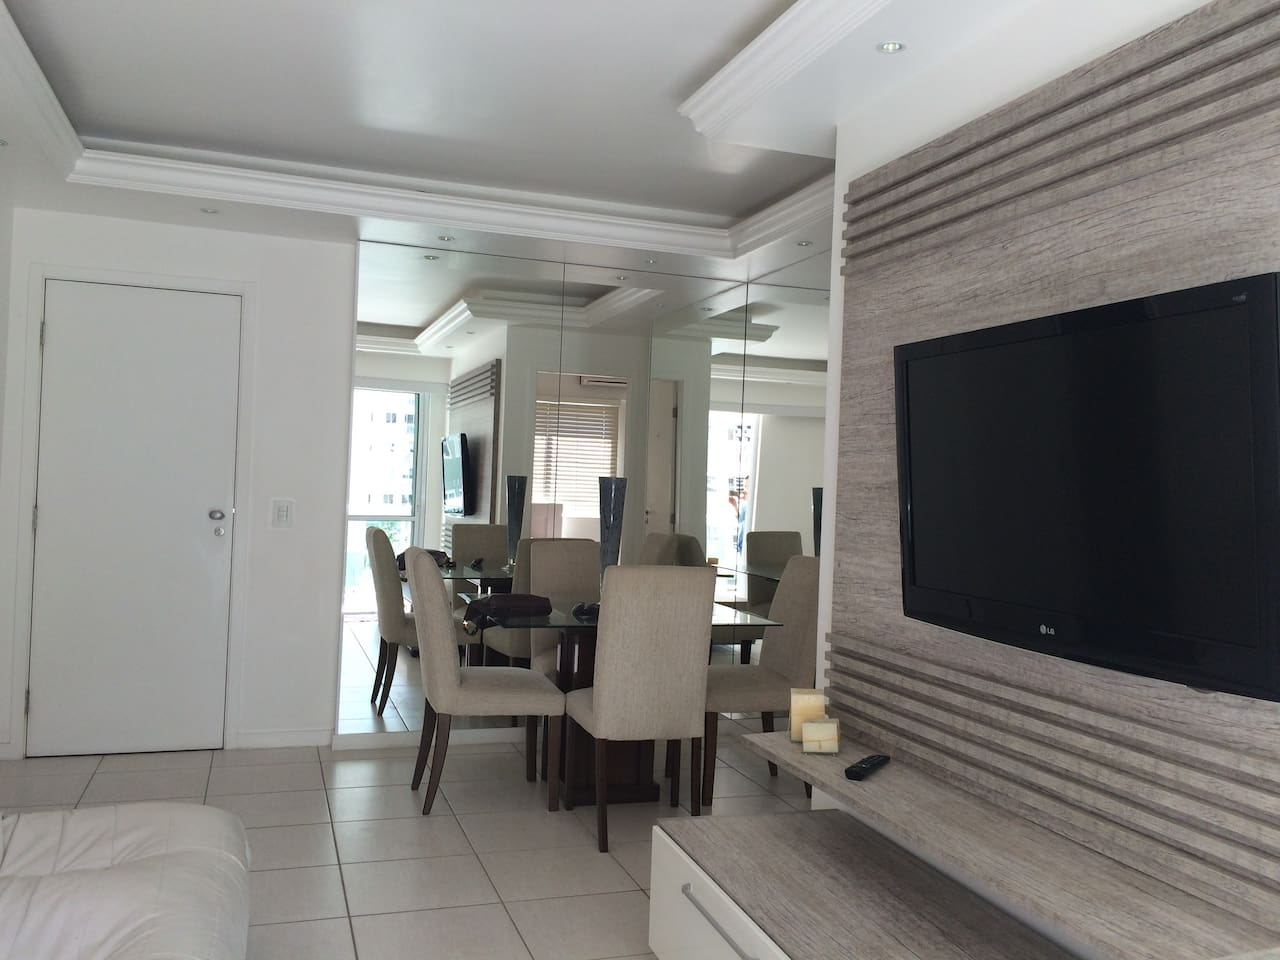 sala para 2 ambientes. Tv a cabo, wifi mesa de jantar , sofa, mesa de jantar